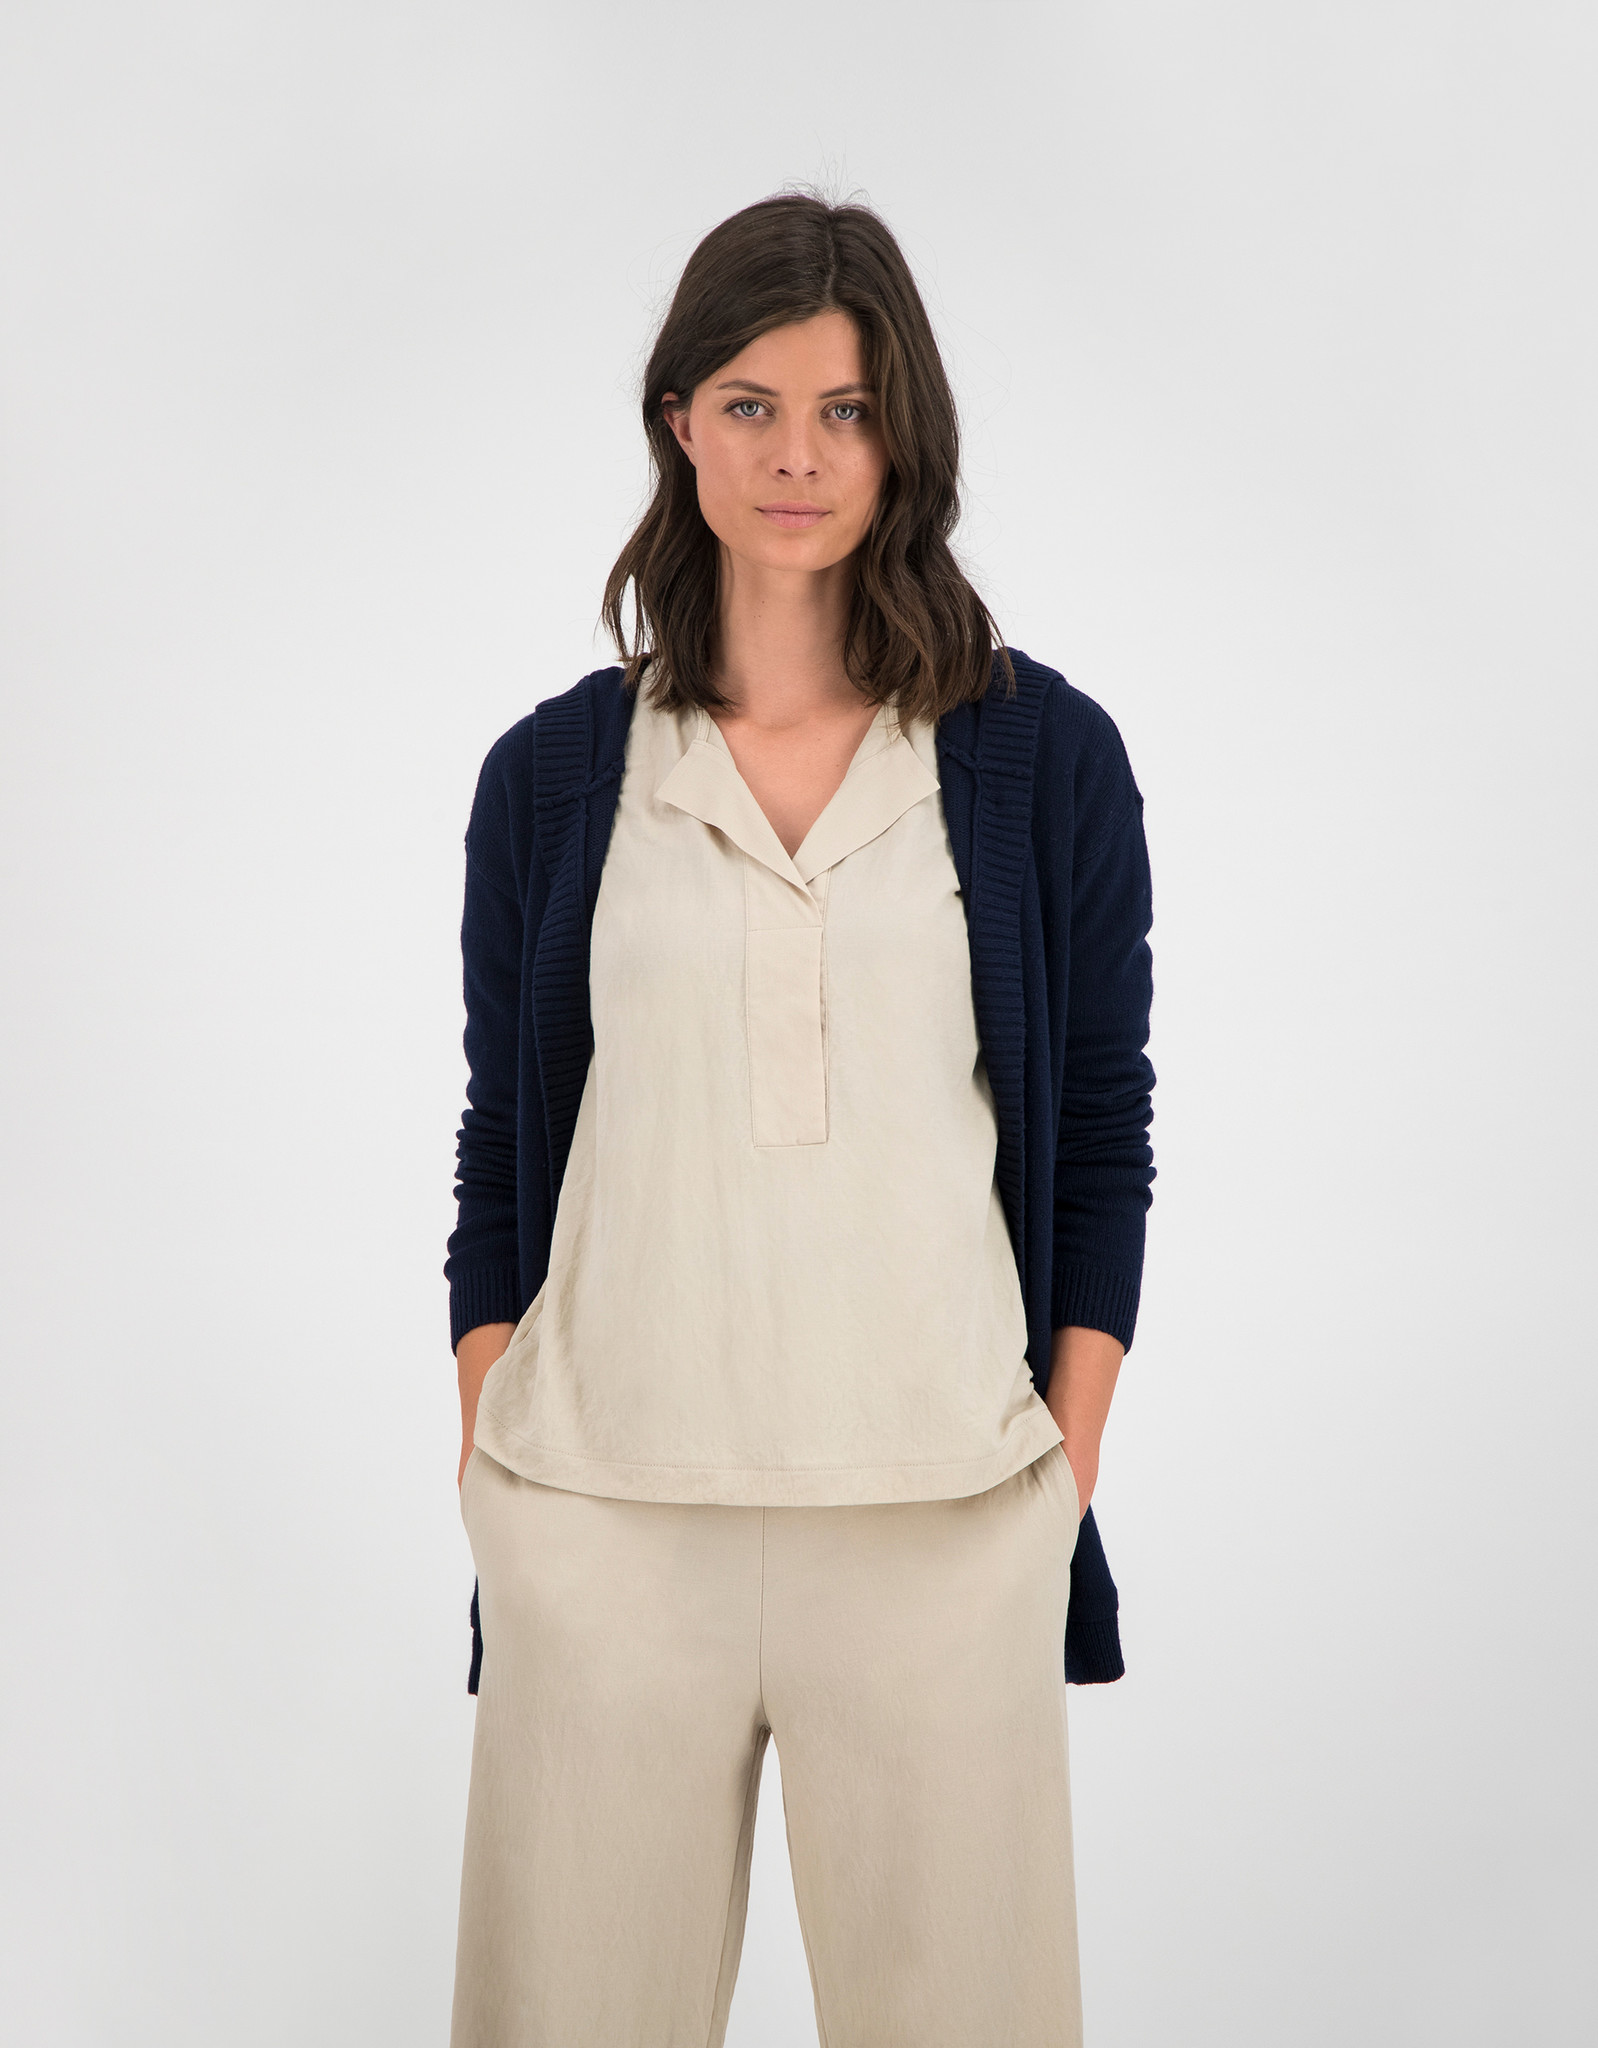 SYLVER Crêpe Stretch Shirt - Oatmeal